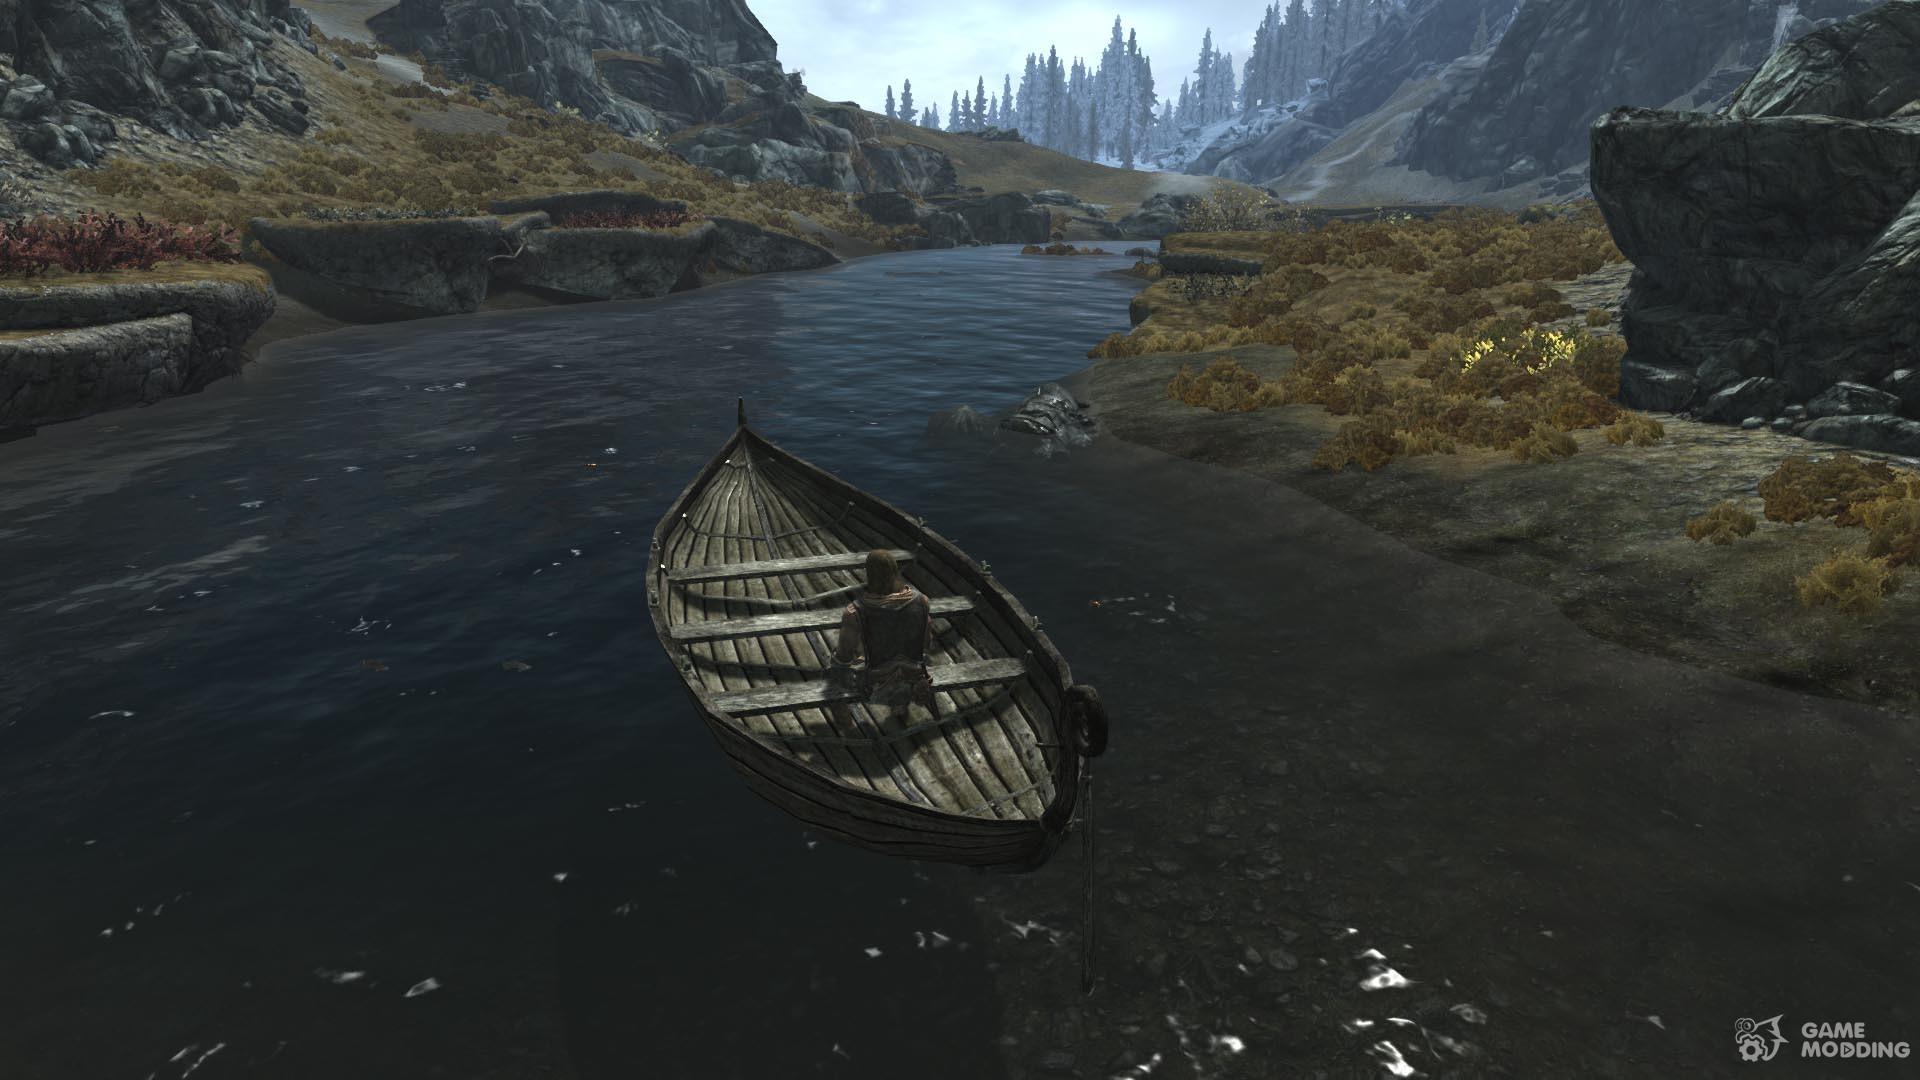 skyrim мод на плавающие лодки